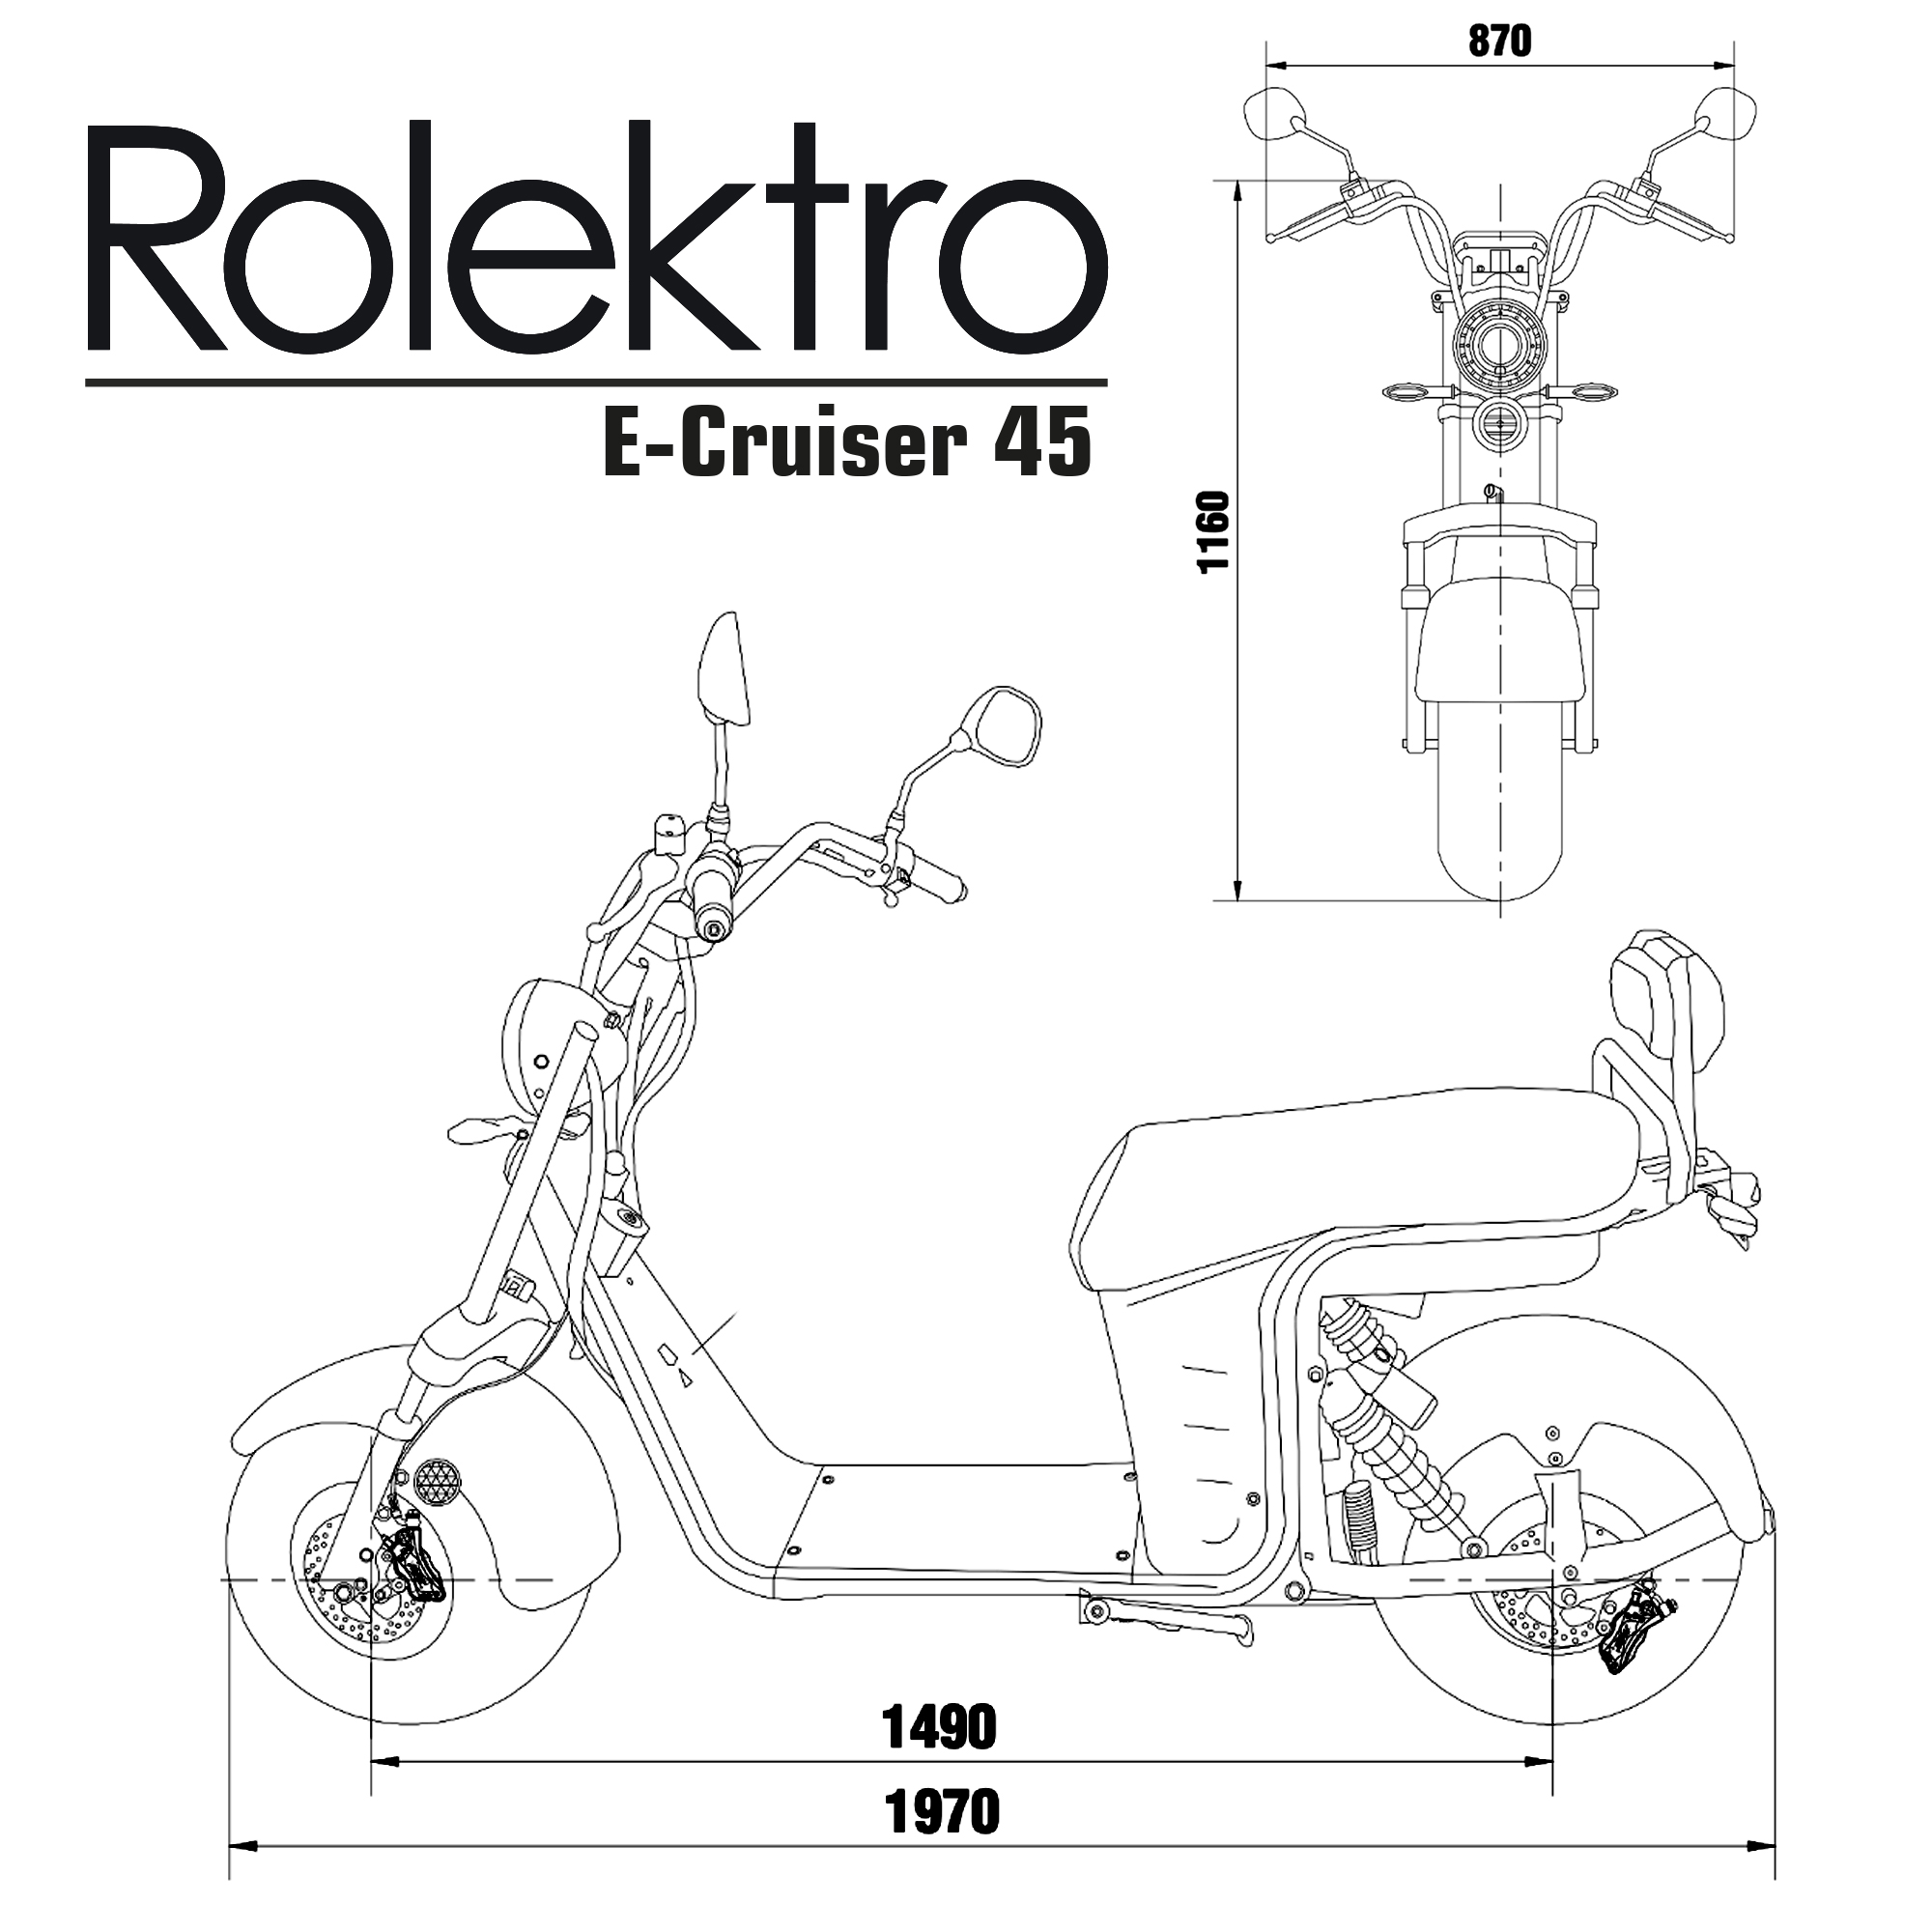 Rolektro, Elektroroller, City Cruiser, E- Chopper, City Coco 90 Bild 4